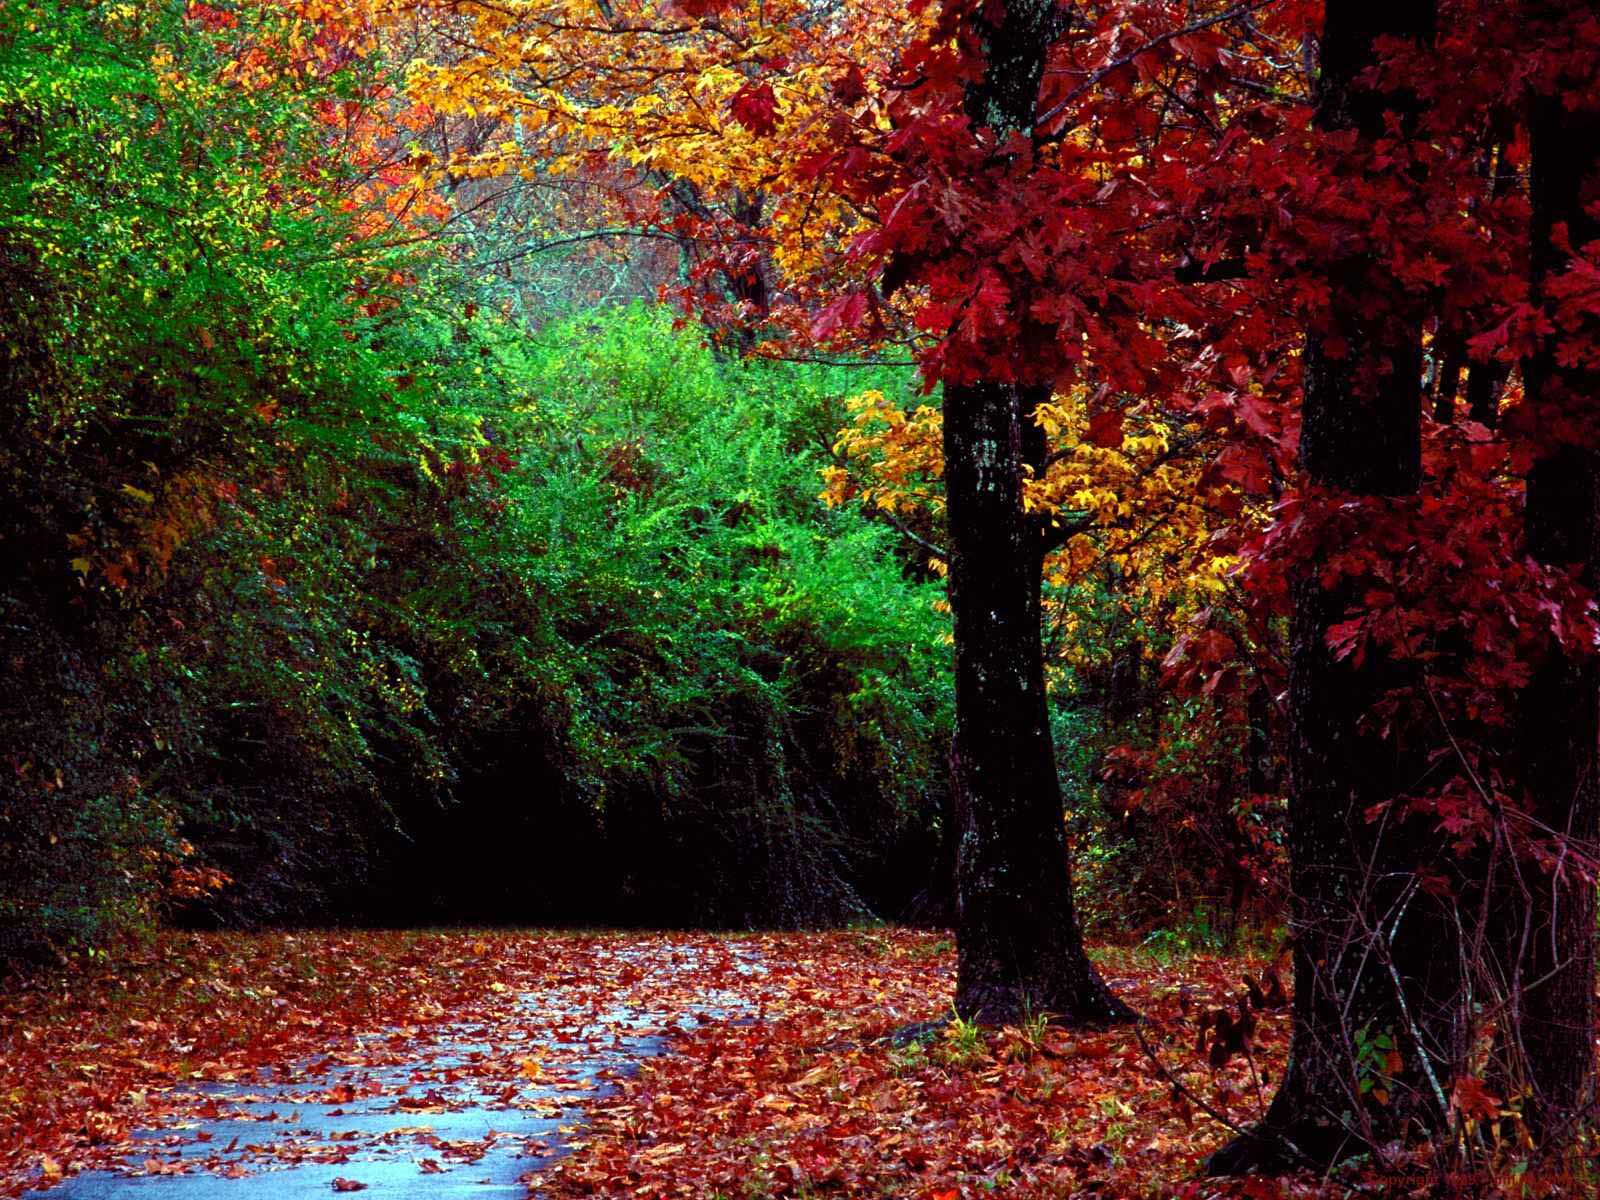 Autumn Wallpapers Widescreen Images Fun 1600x1200